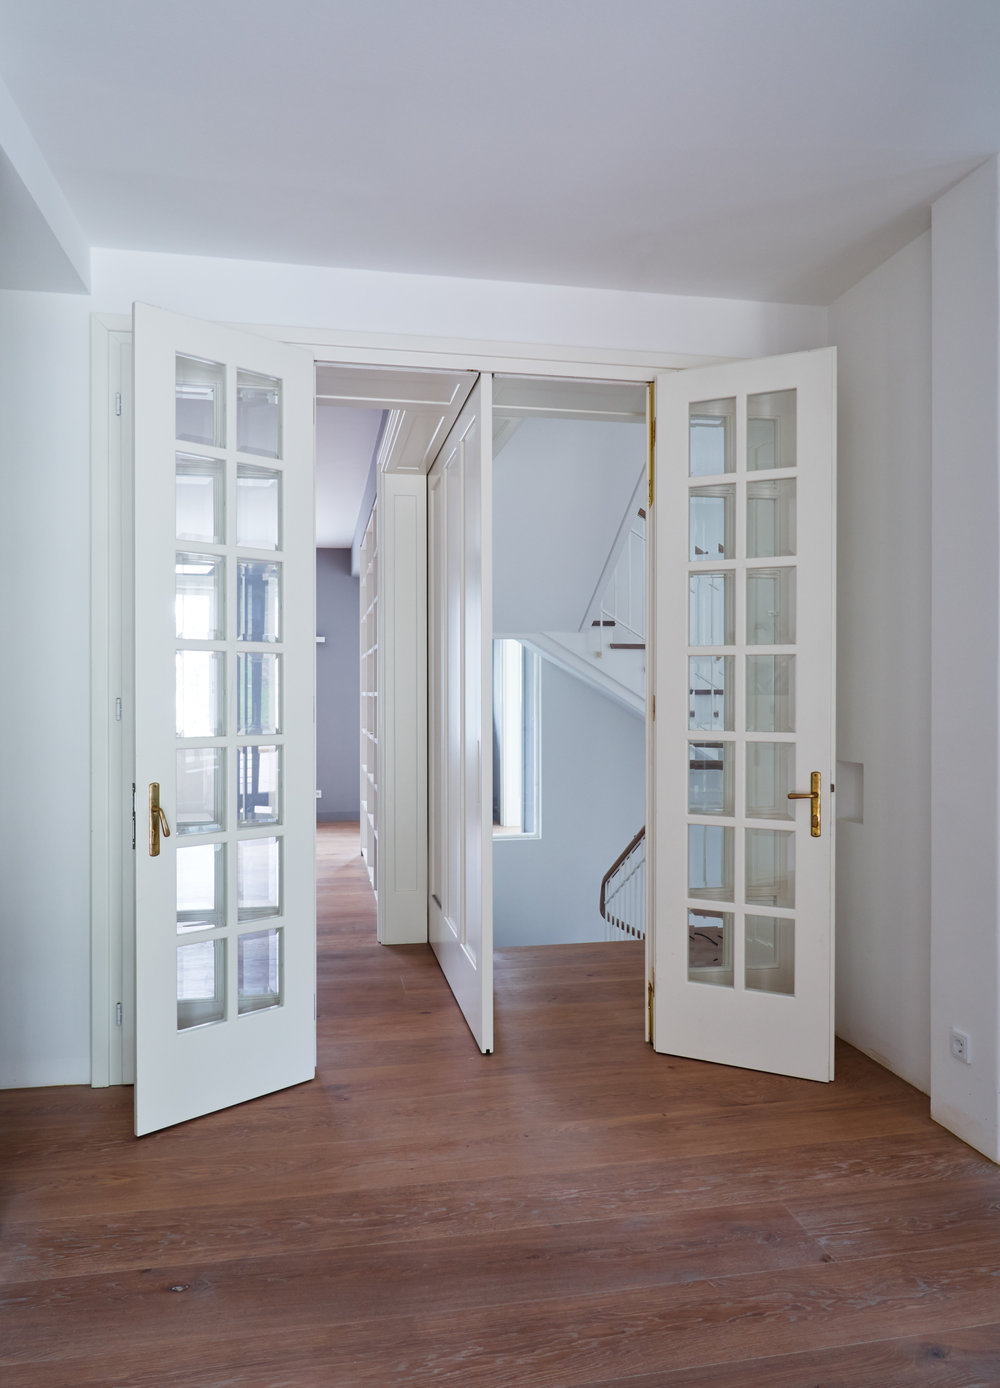 Haus P., Wien